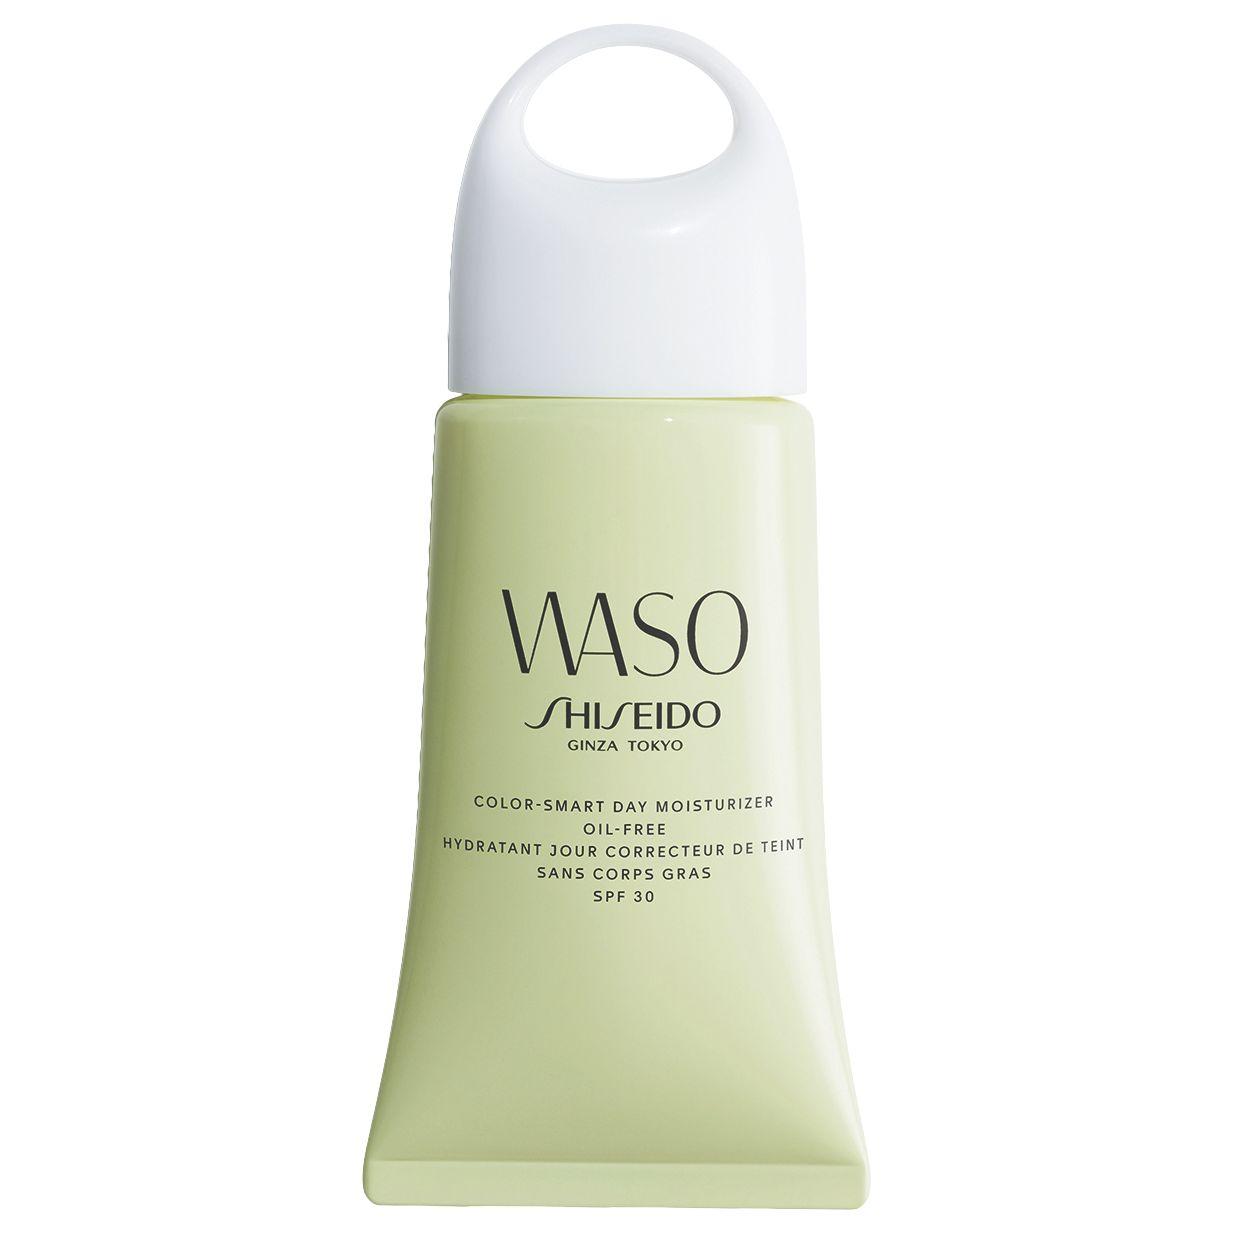 Shiseido Shiseido WASO Colour-Smart Day Moisturiser Oil Free SPF 30, 50ml